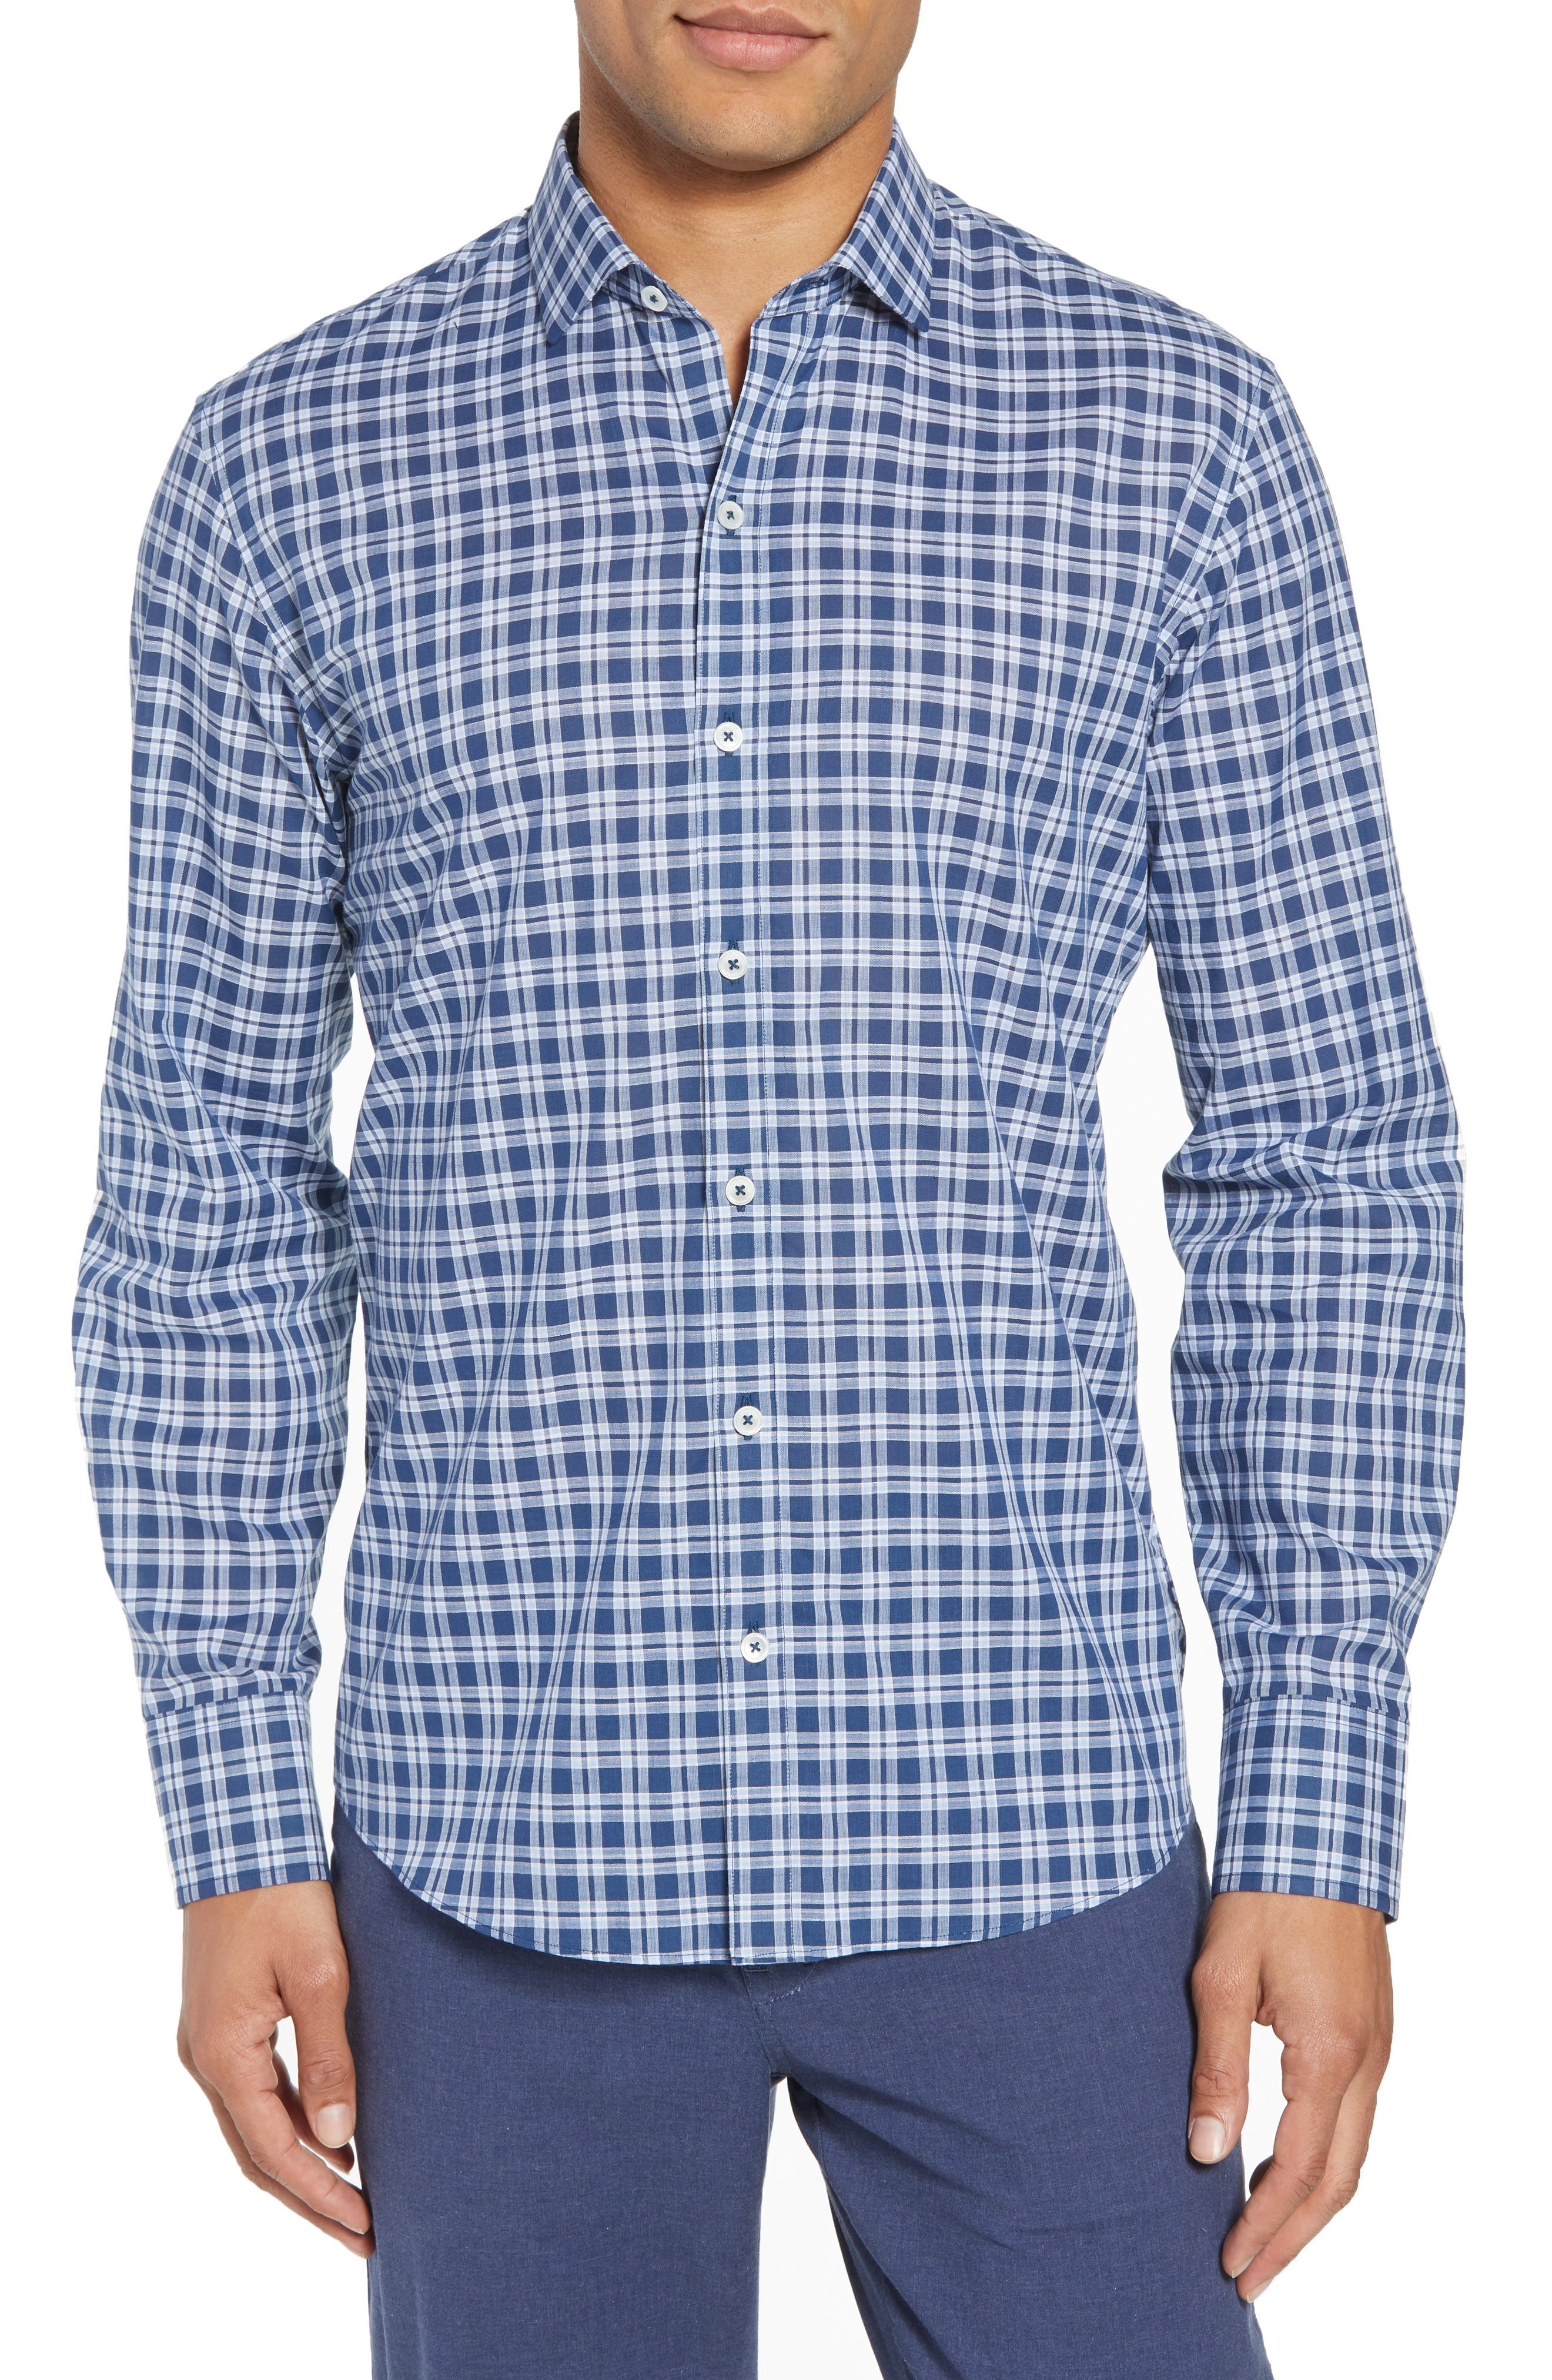 Speer Regular Fit Sport Shirt,                         Main,                         color, Indigo